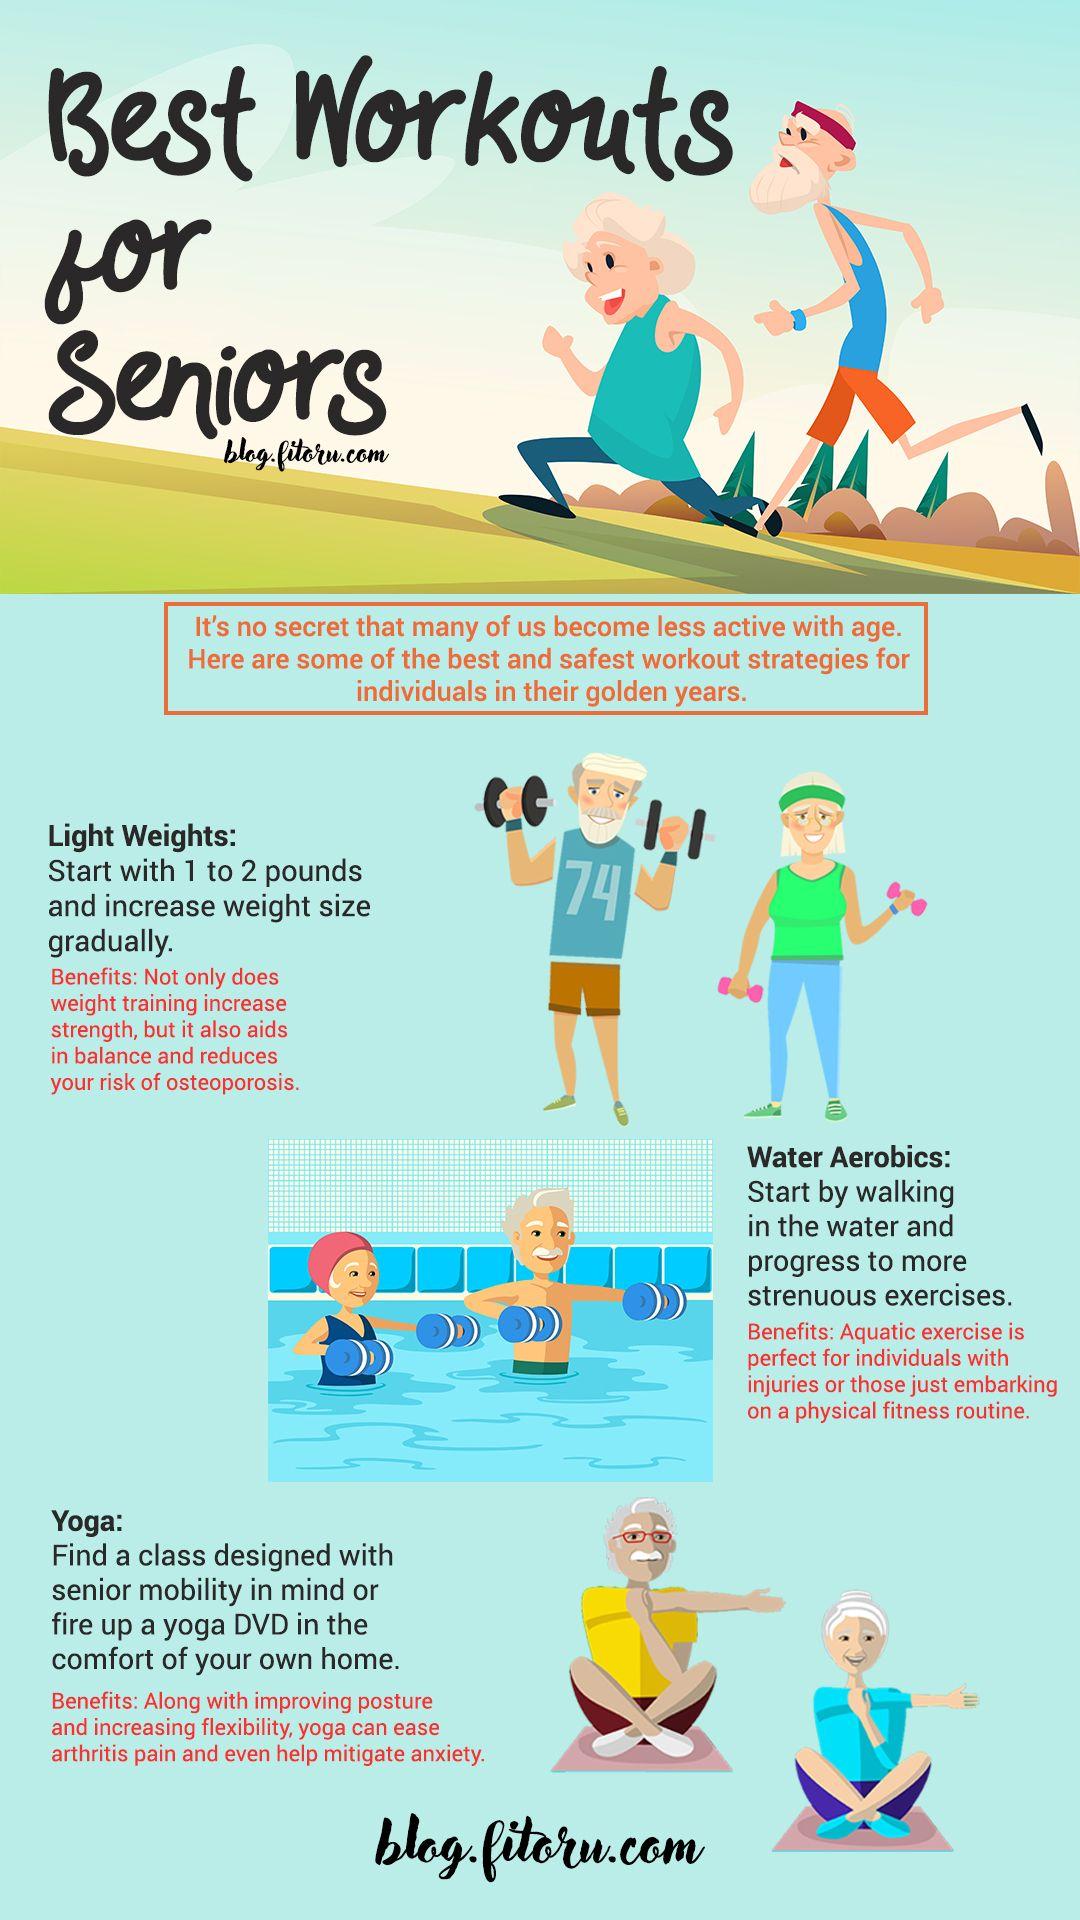 Exercise Tips for Senior/Elder Americans (and Their Loved